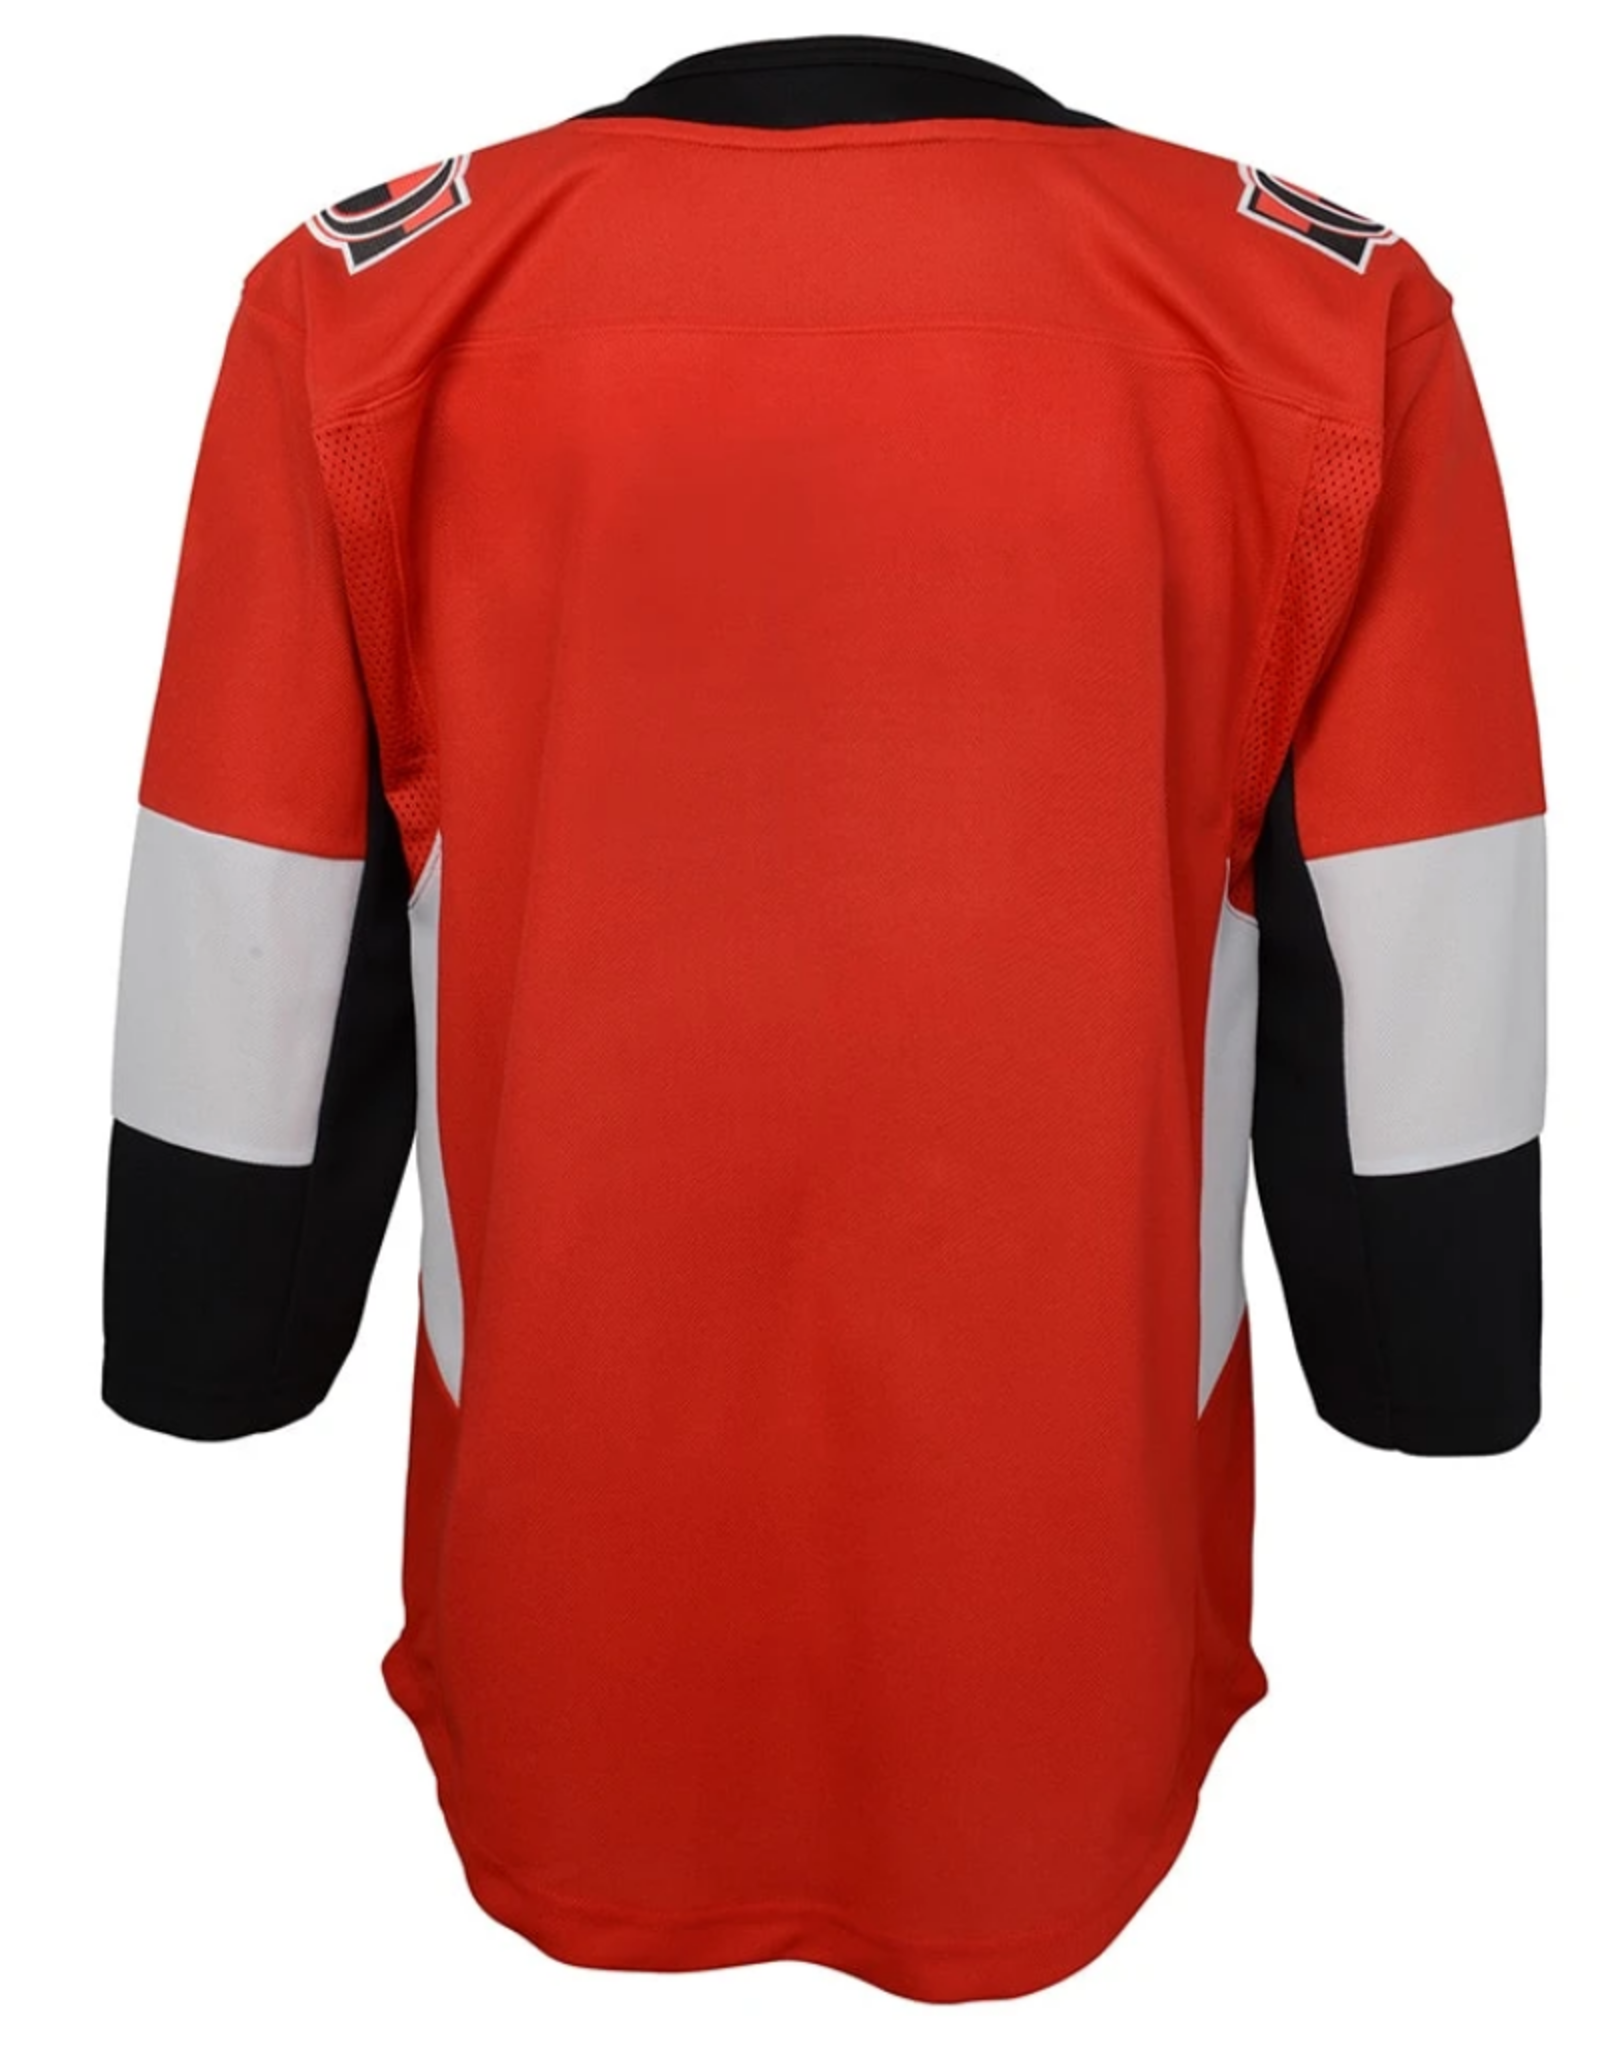 NHL Youth Premier Home Jersey Ottawa Senators Red